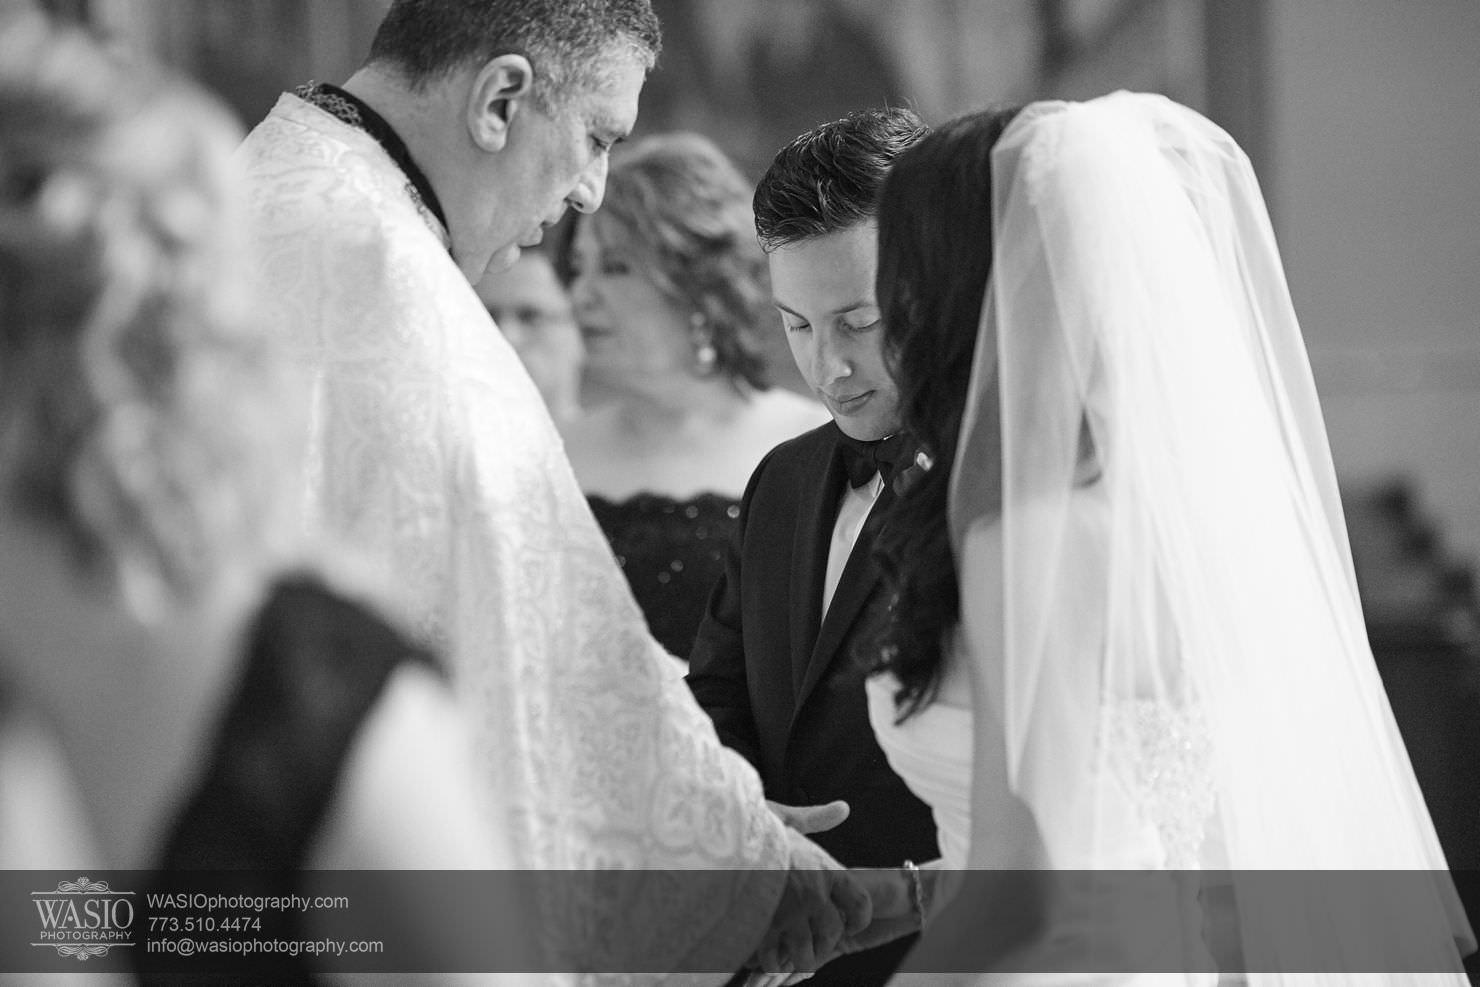 021_Chicago-Spring-Wedding_Chrissy-Andrew_3P4C5566 Chicago Spring Wedding - Chrissy + Andrew